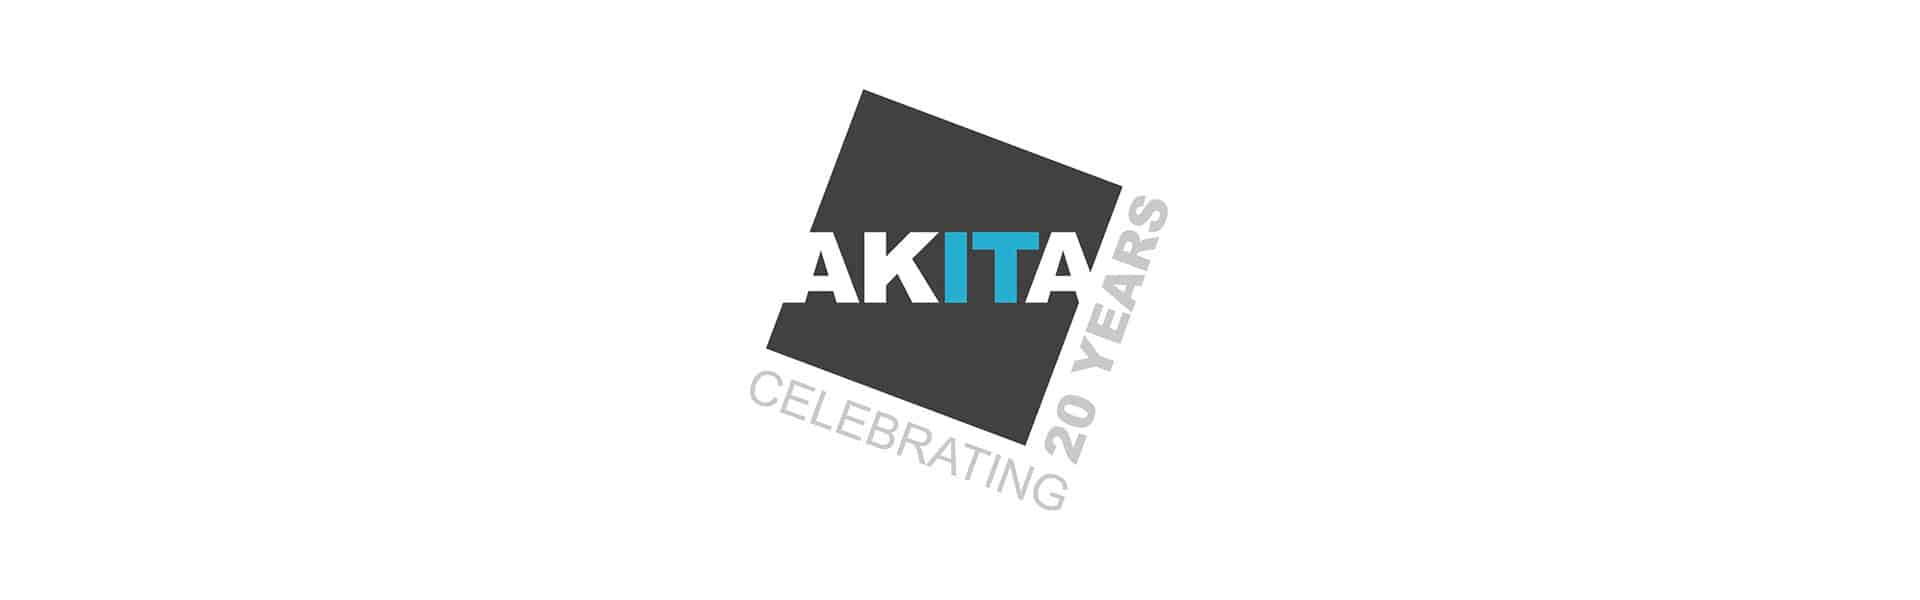 Akita Celebrating 20 Years